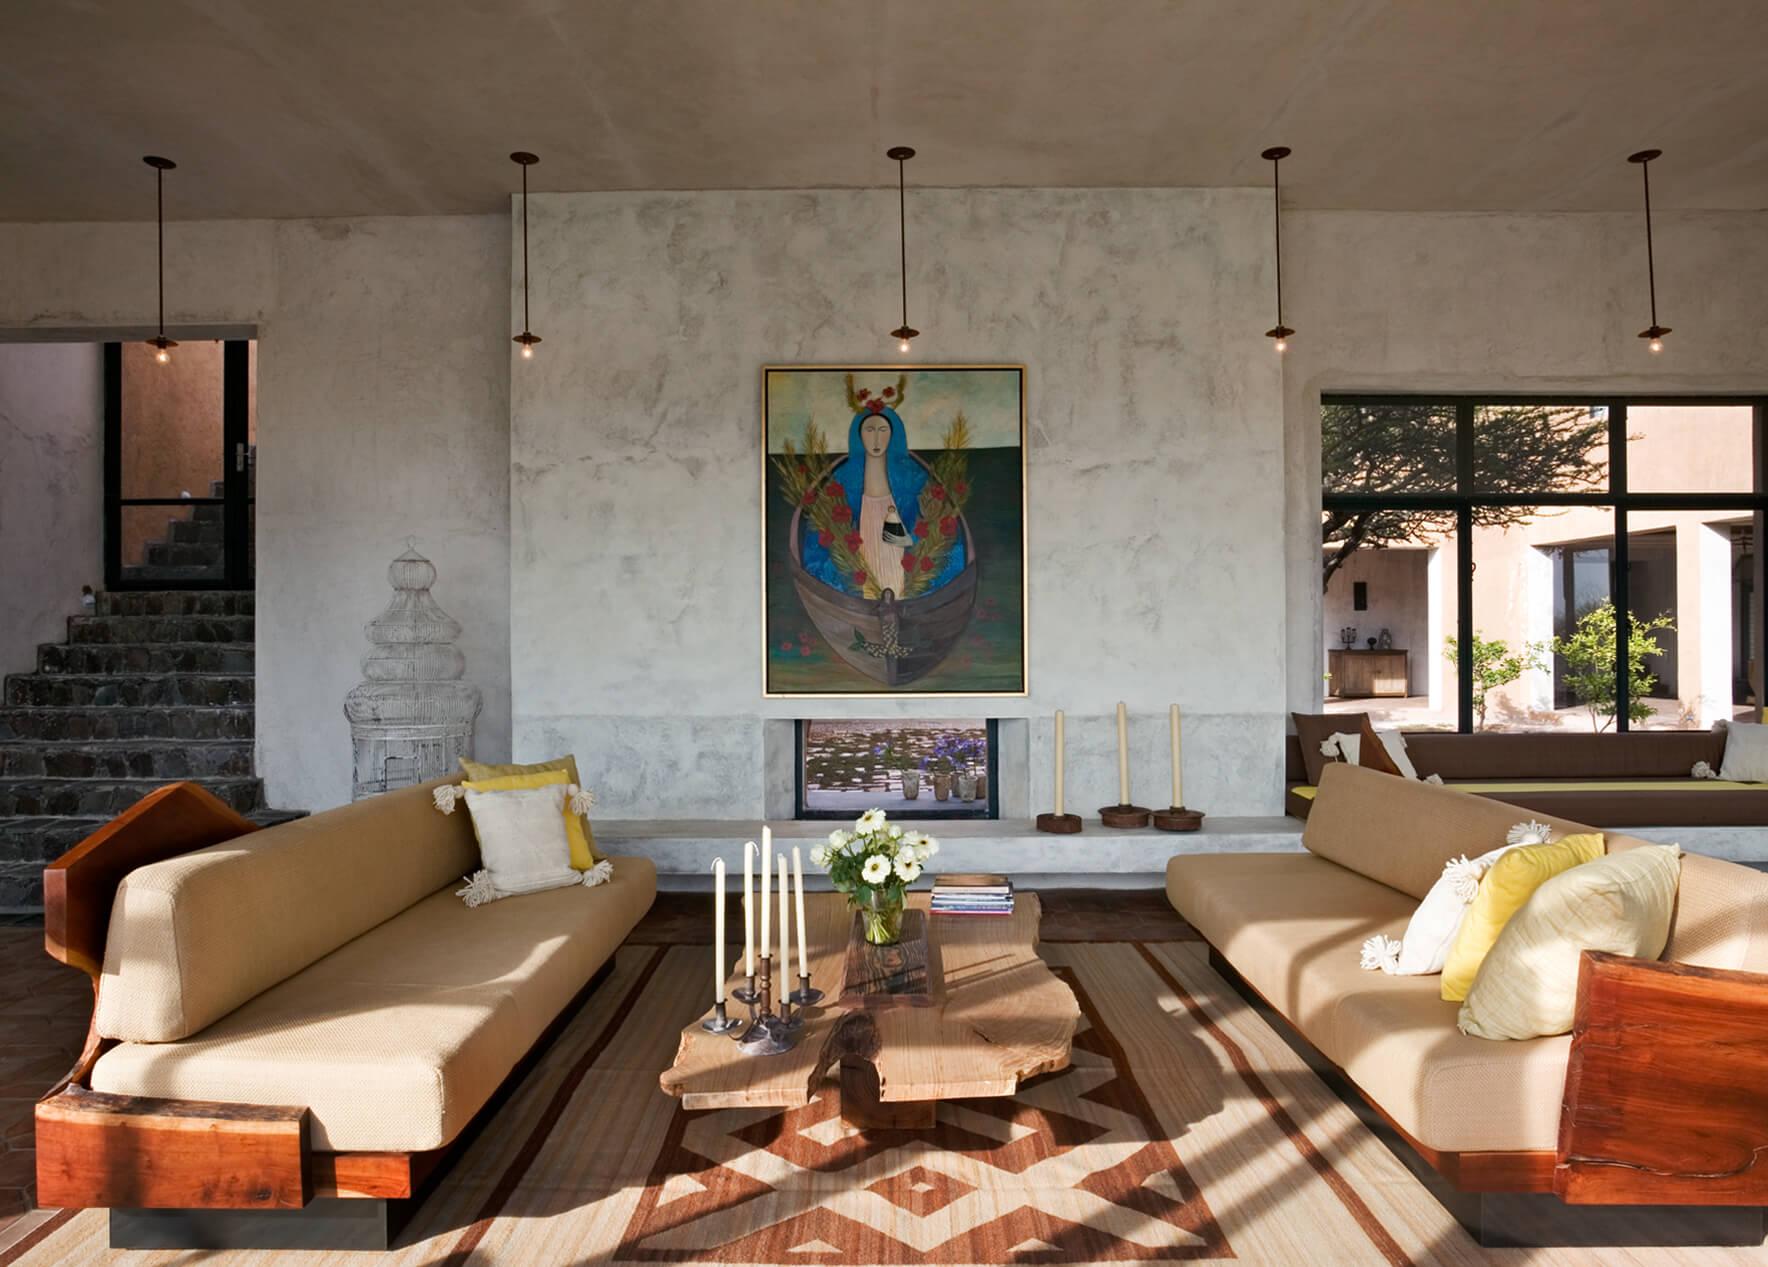 Casa san miguel de allende dhd architecture interior design - Casa interior design ...